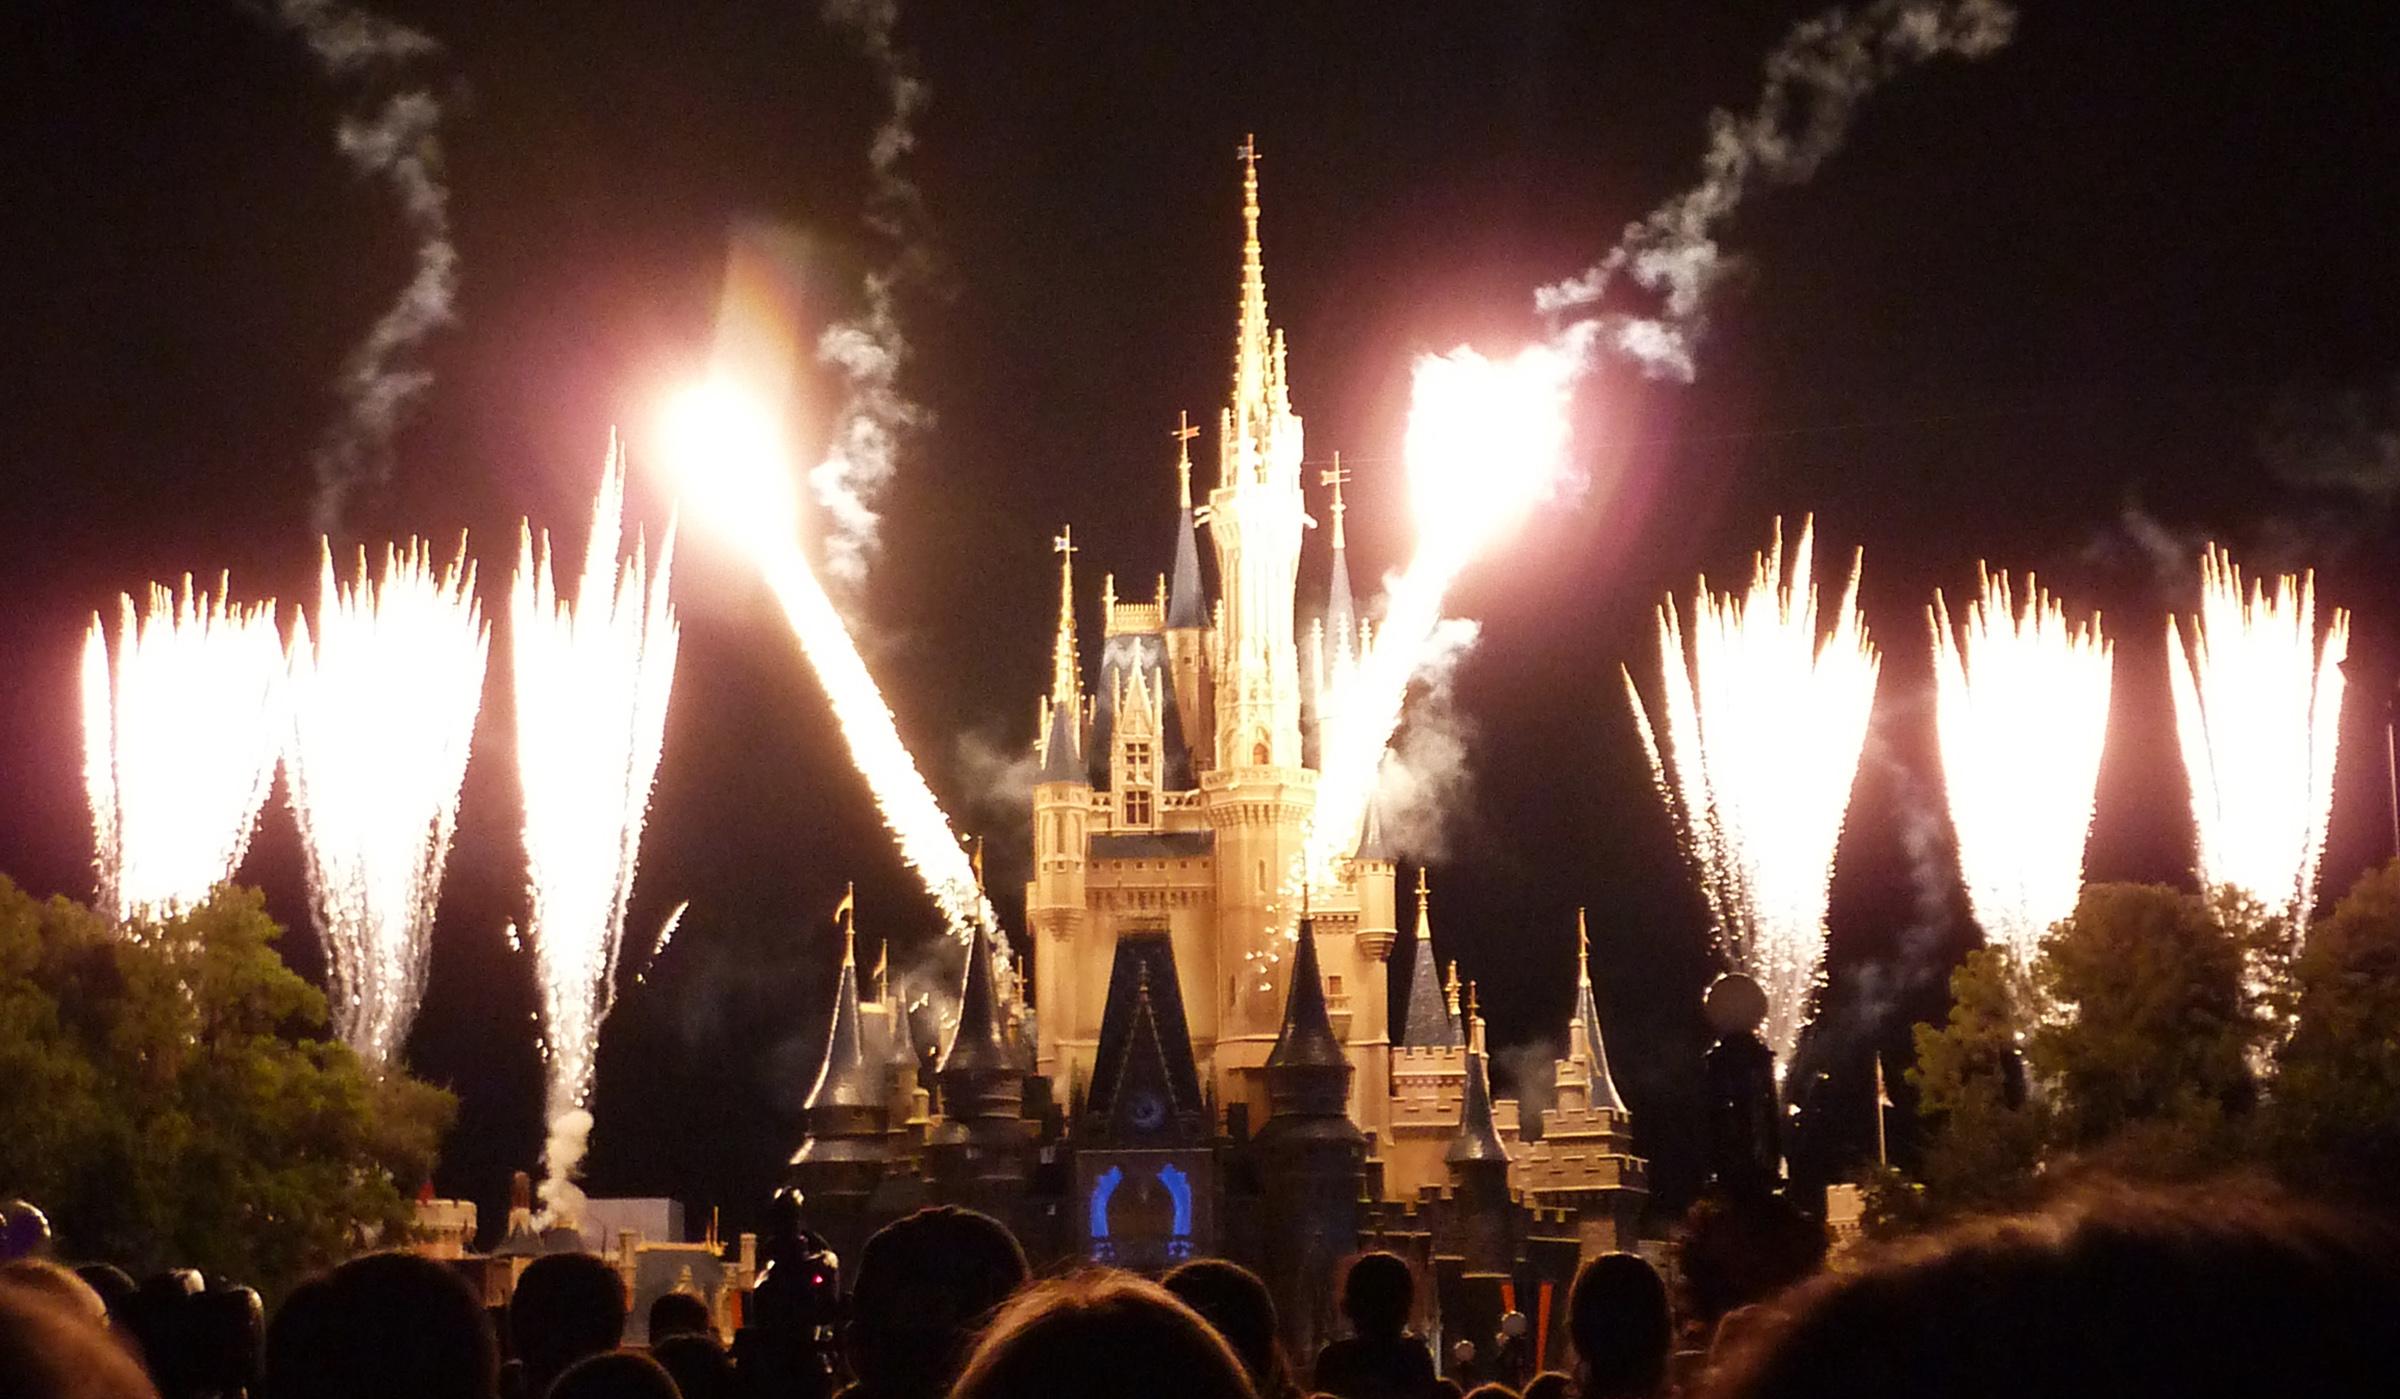 Fireworks at the Magic Kingdom in Walt Disney World Orlando, Florida